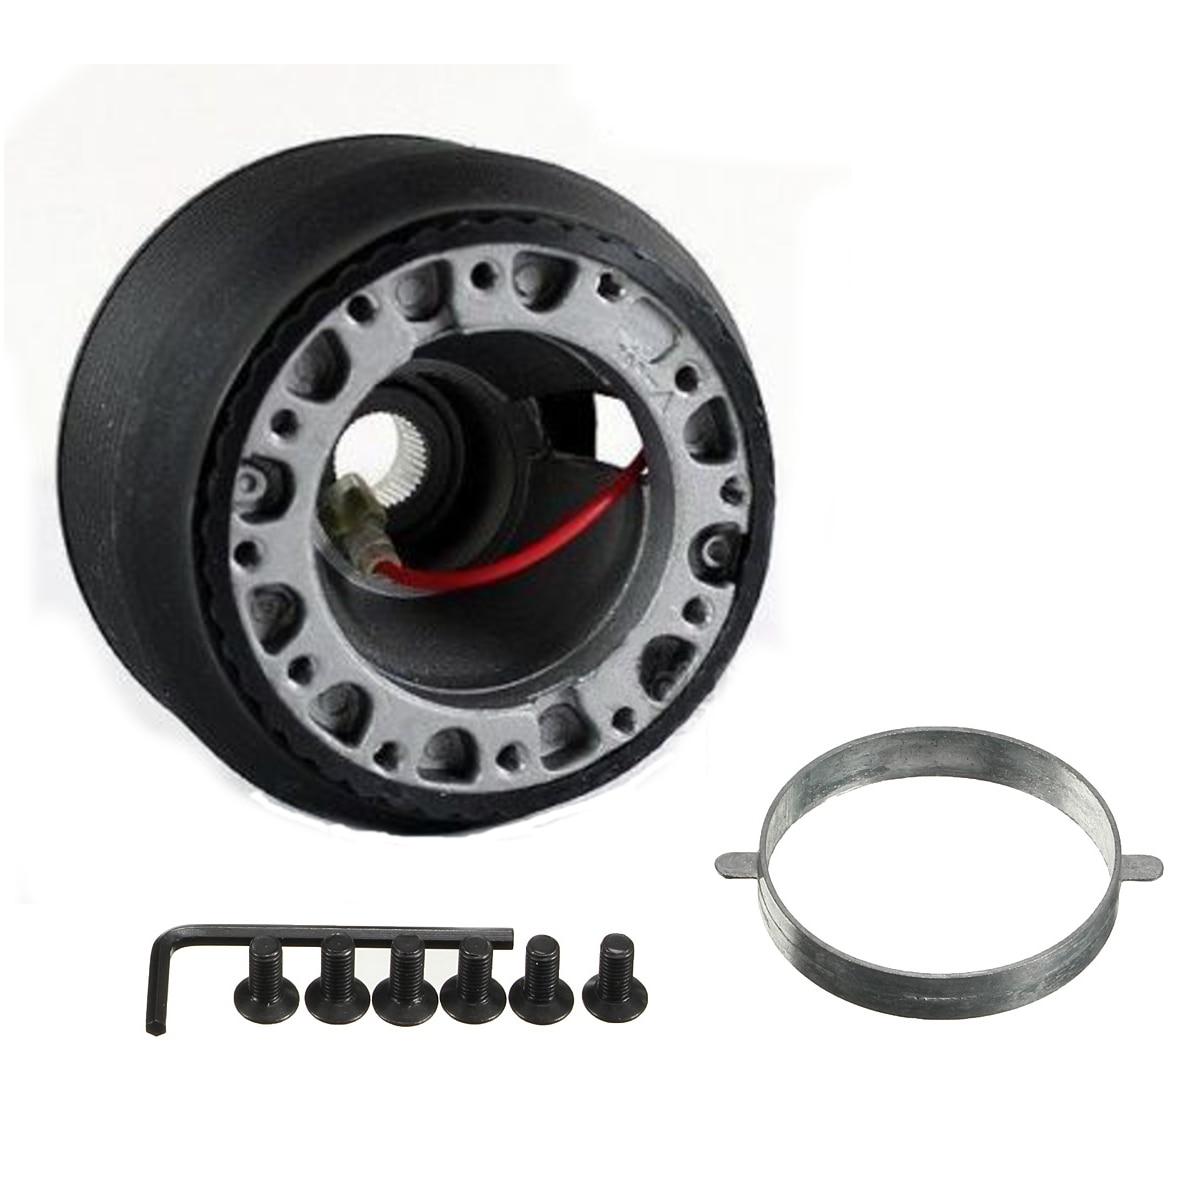 Aluminum 16mm Racing Steering Wheel Boss Kit Hub Adapter FOR Mazda MX5 MX-5